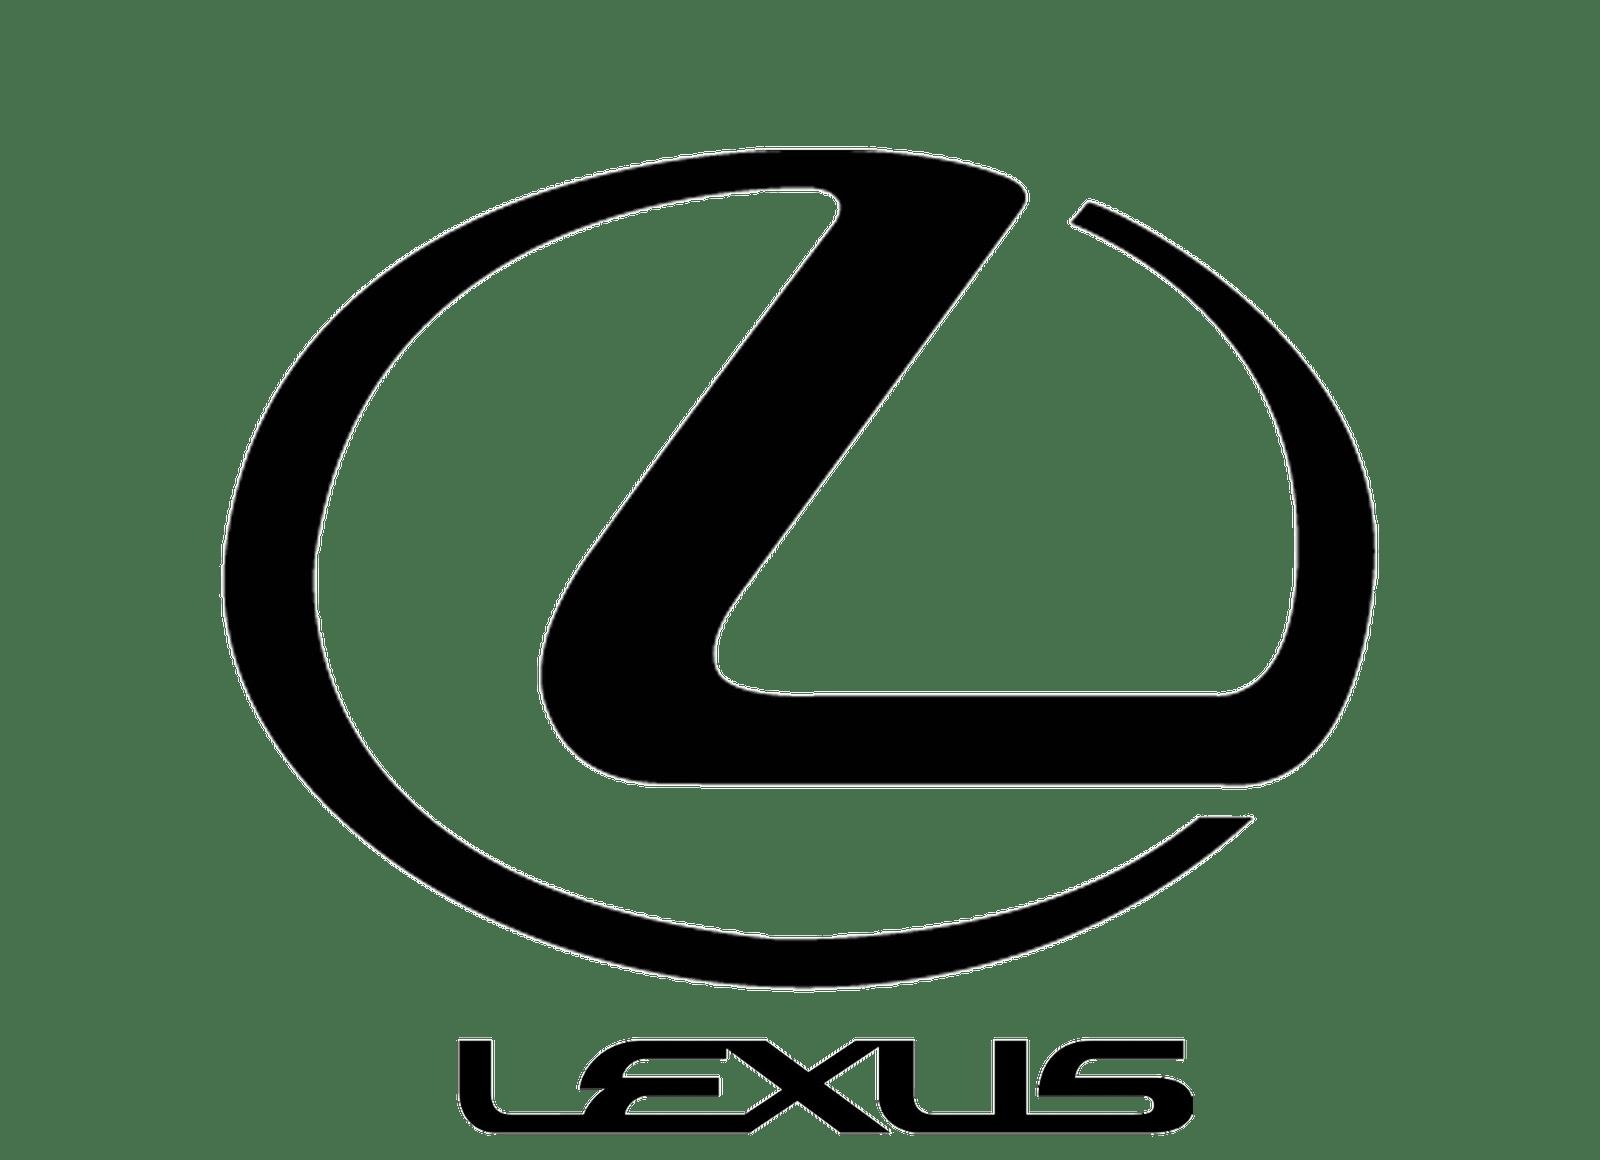 Lexus - Headline Sponsor